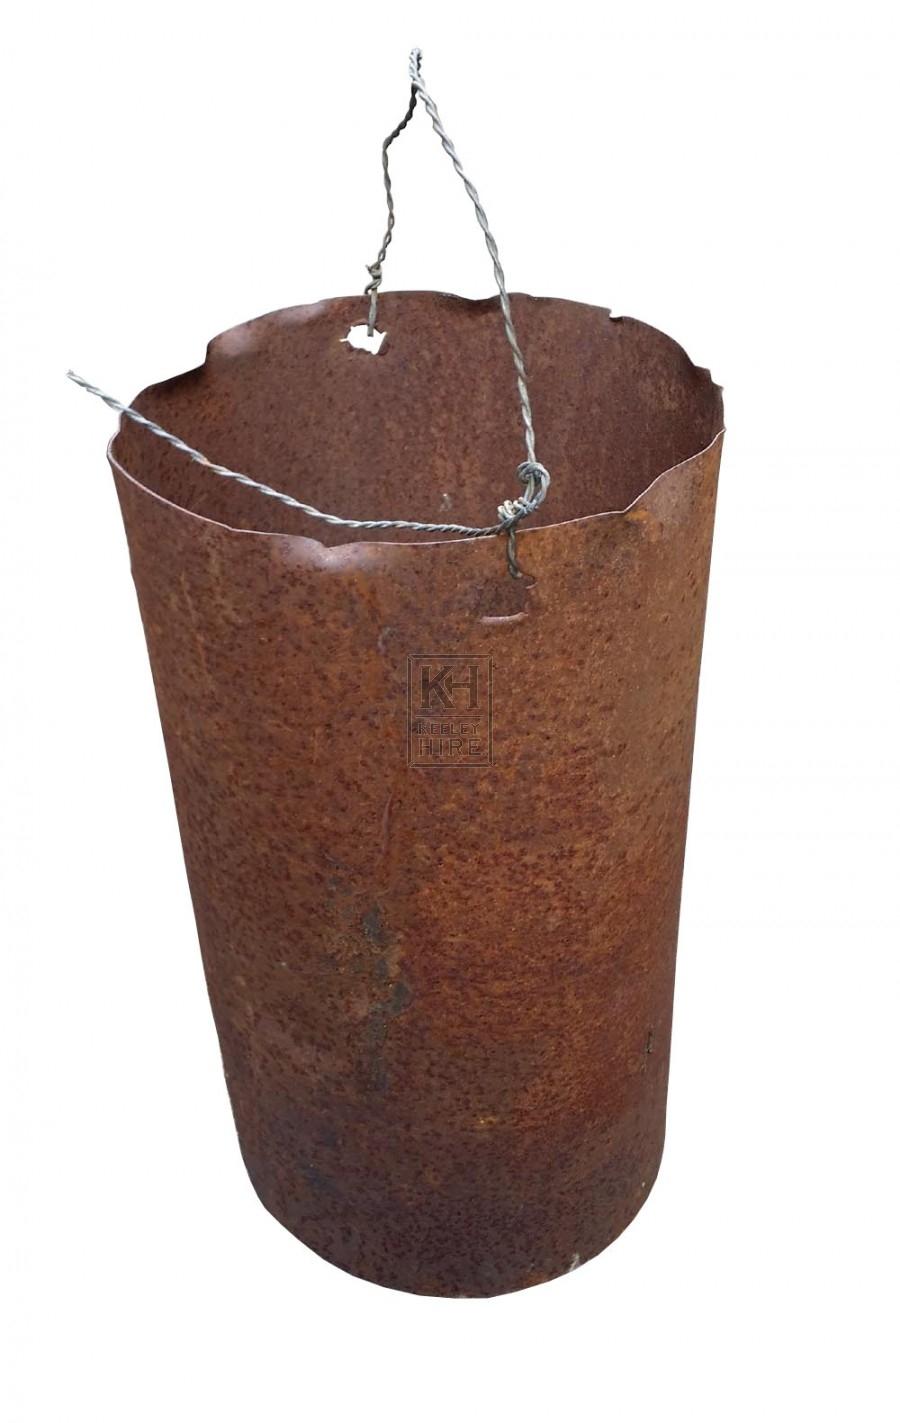 Rusty metal drum